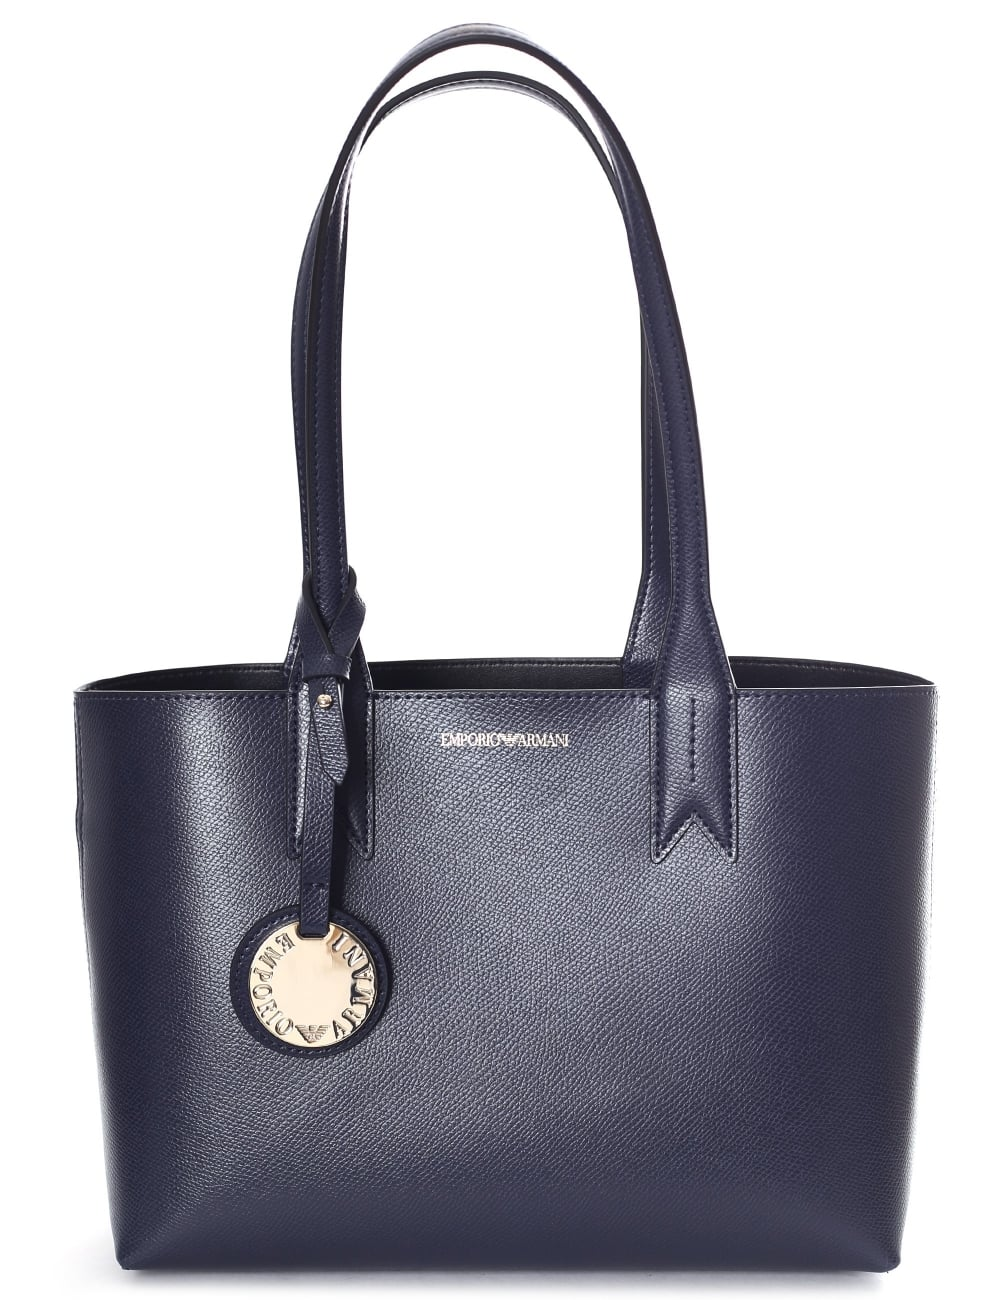 fb19a03e5 Emporio Armani Women's Frida Small Shopper Bag